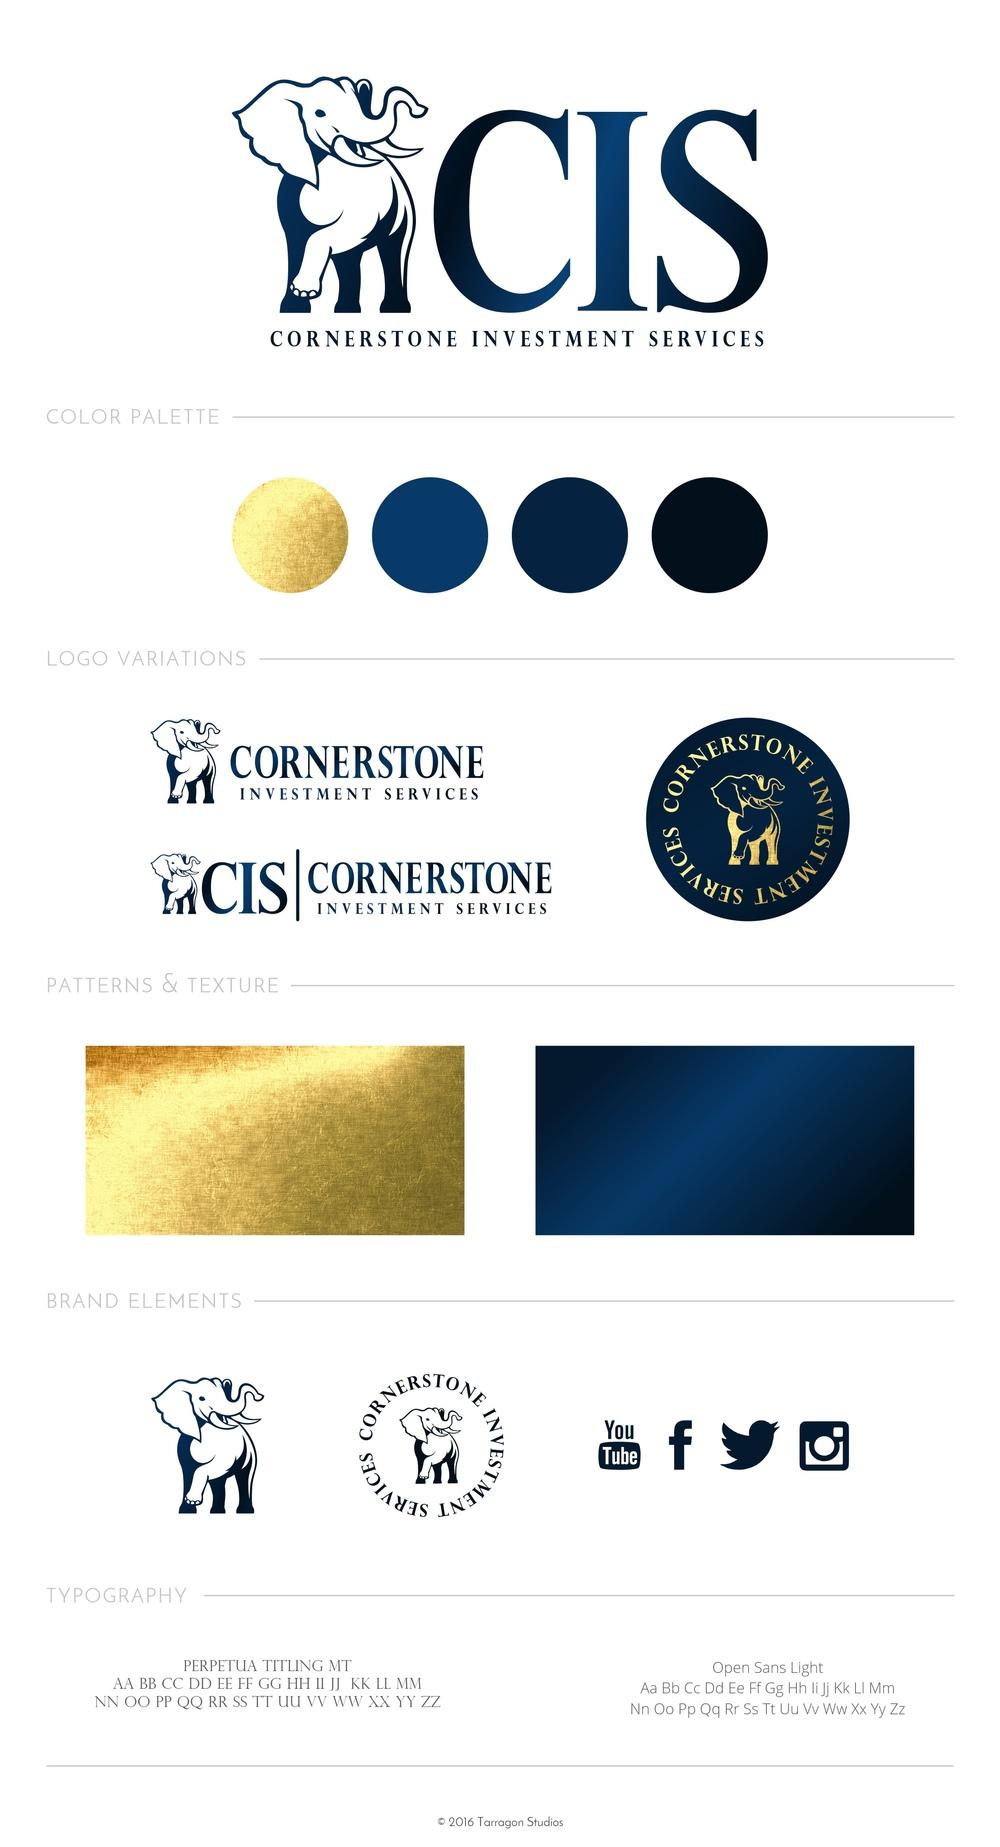 Logo & Brand for Cornerstone Investment Services by Tarragon Studios. #logo #design #branding #unique